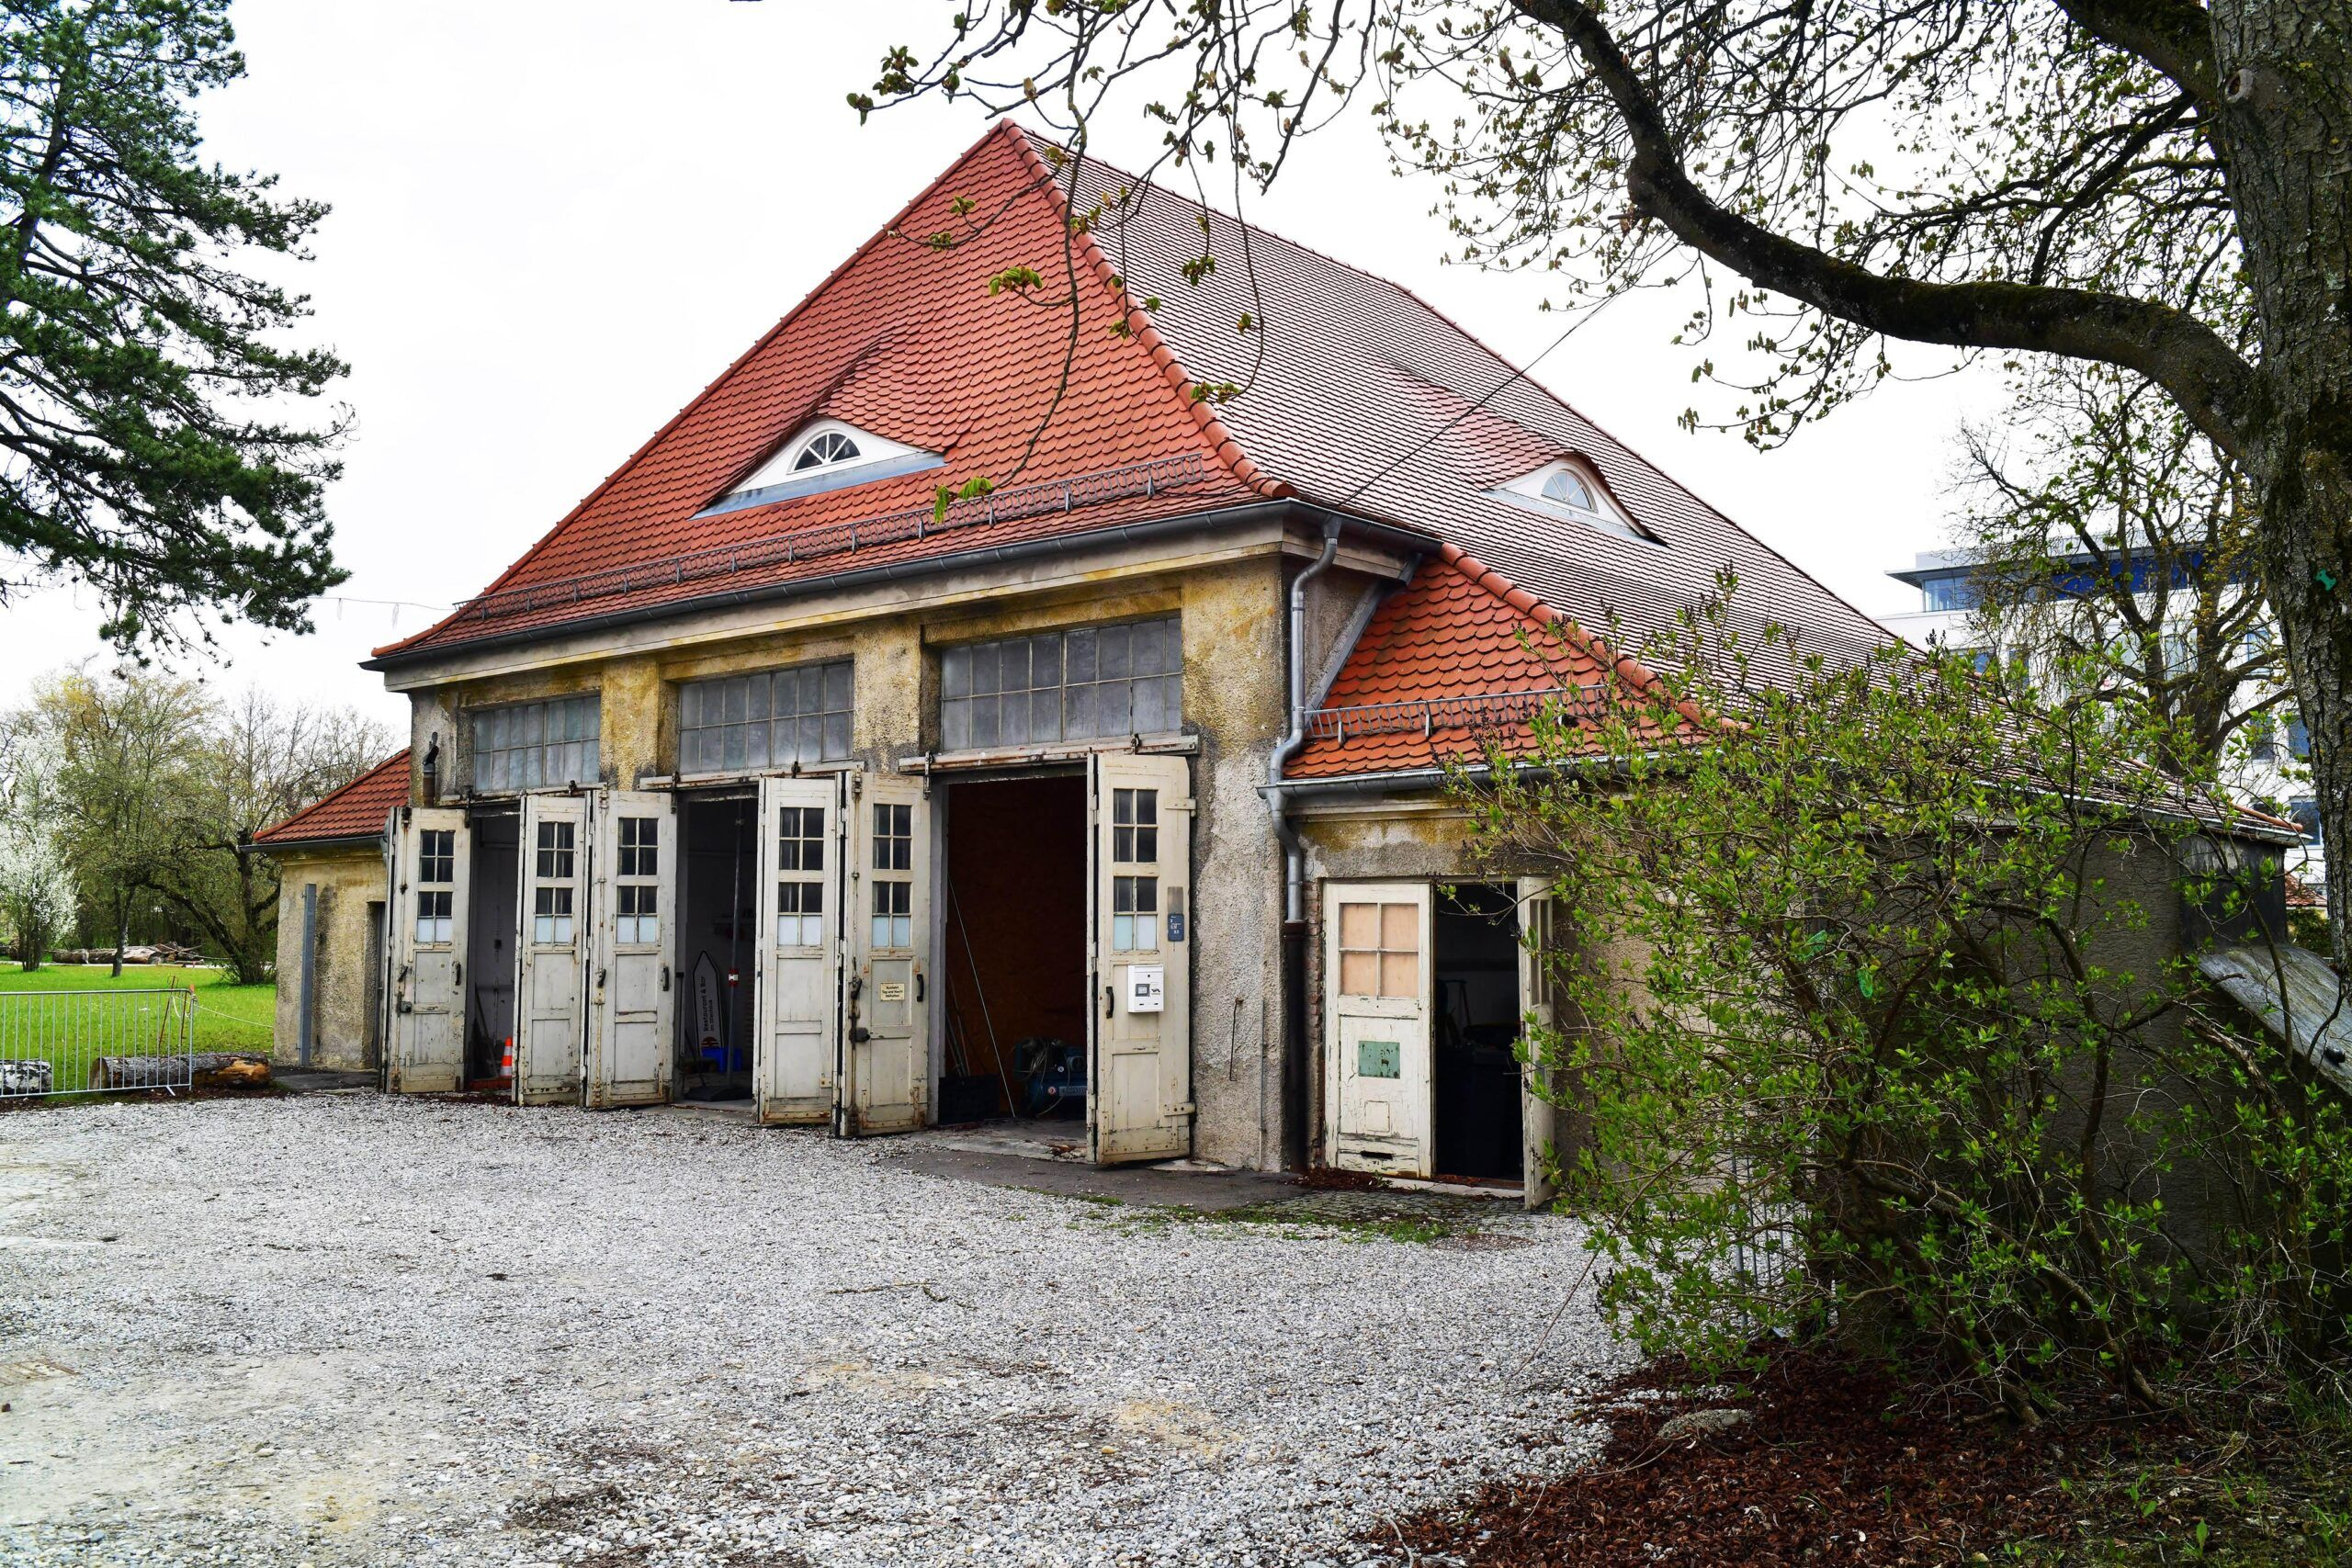 2021 04 30 Gaswerk Gastronomie Garagengebaeude 1 Scaled